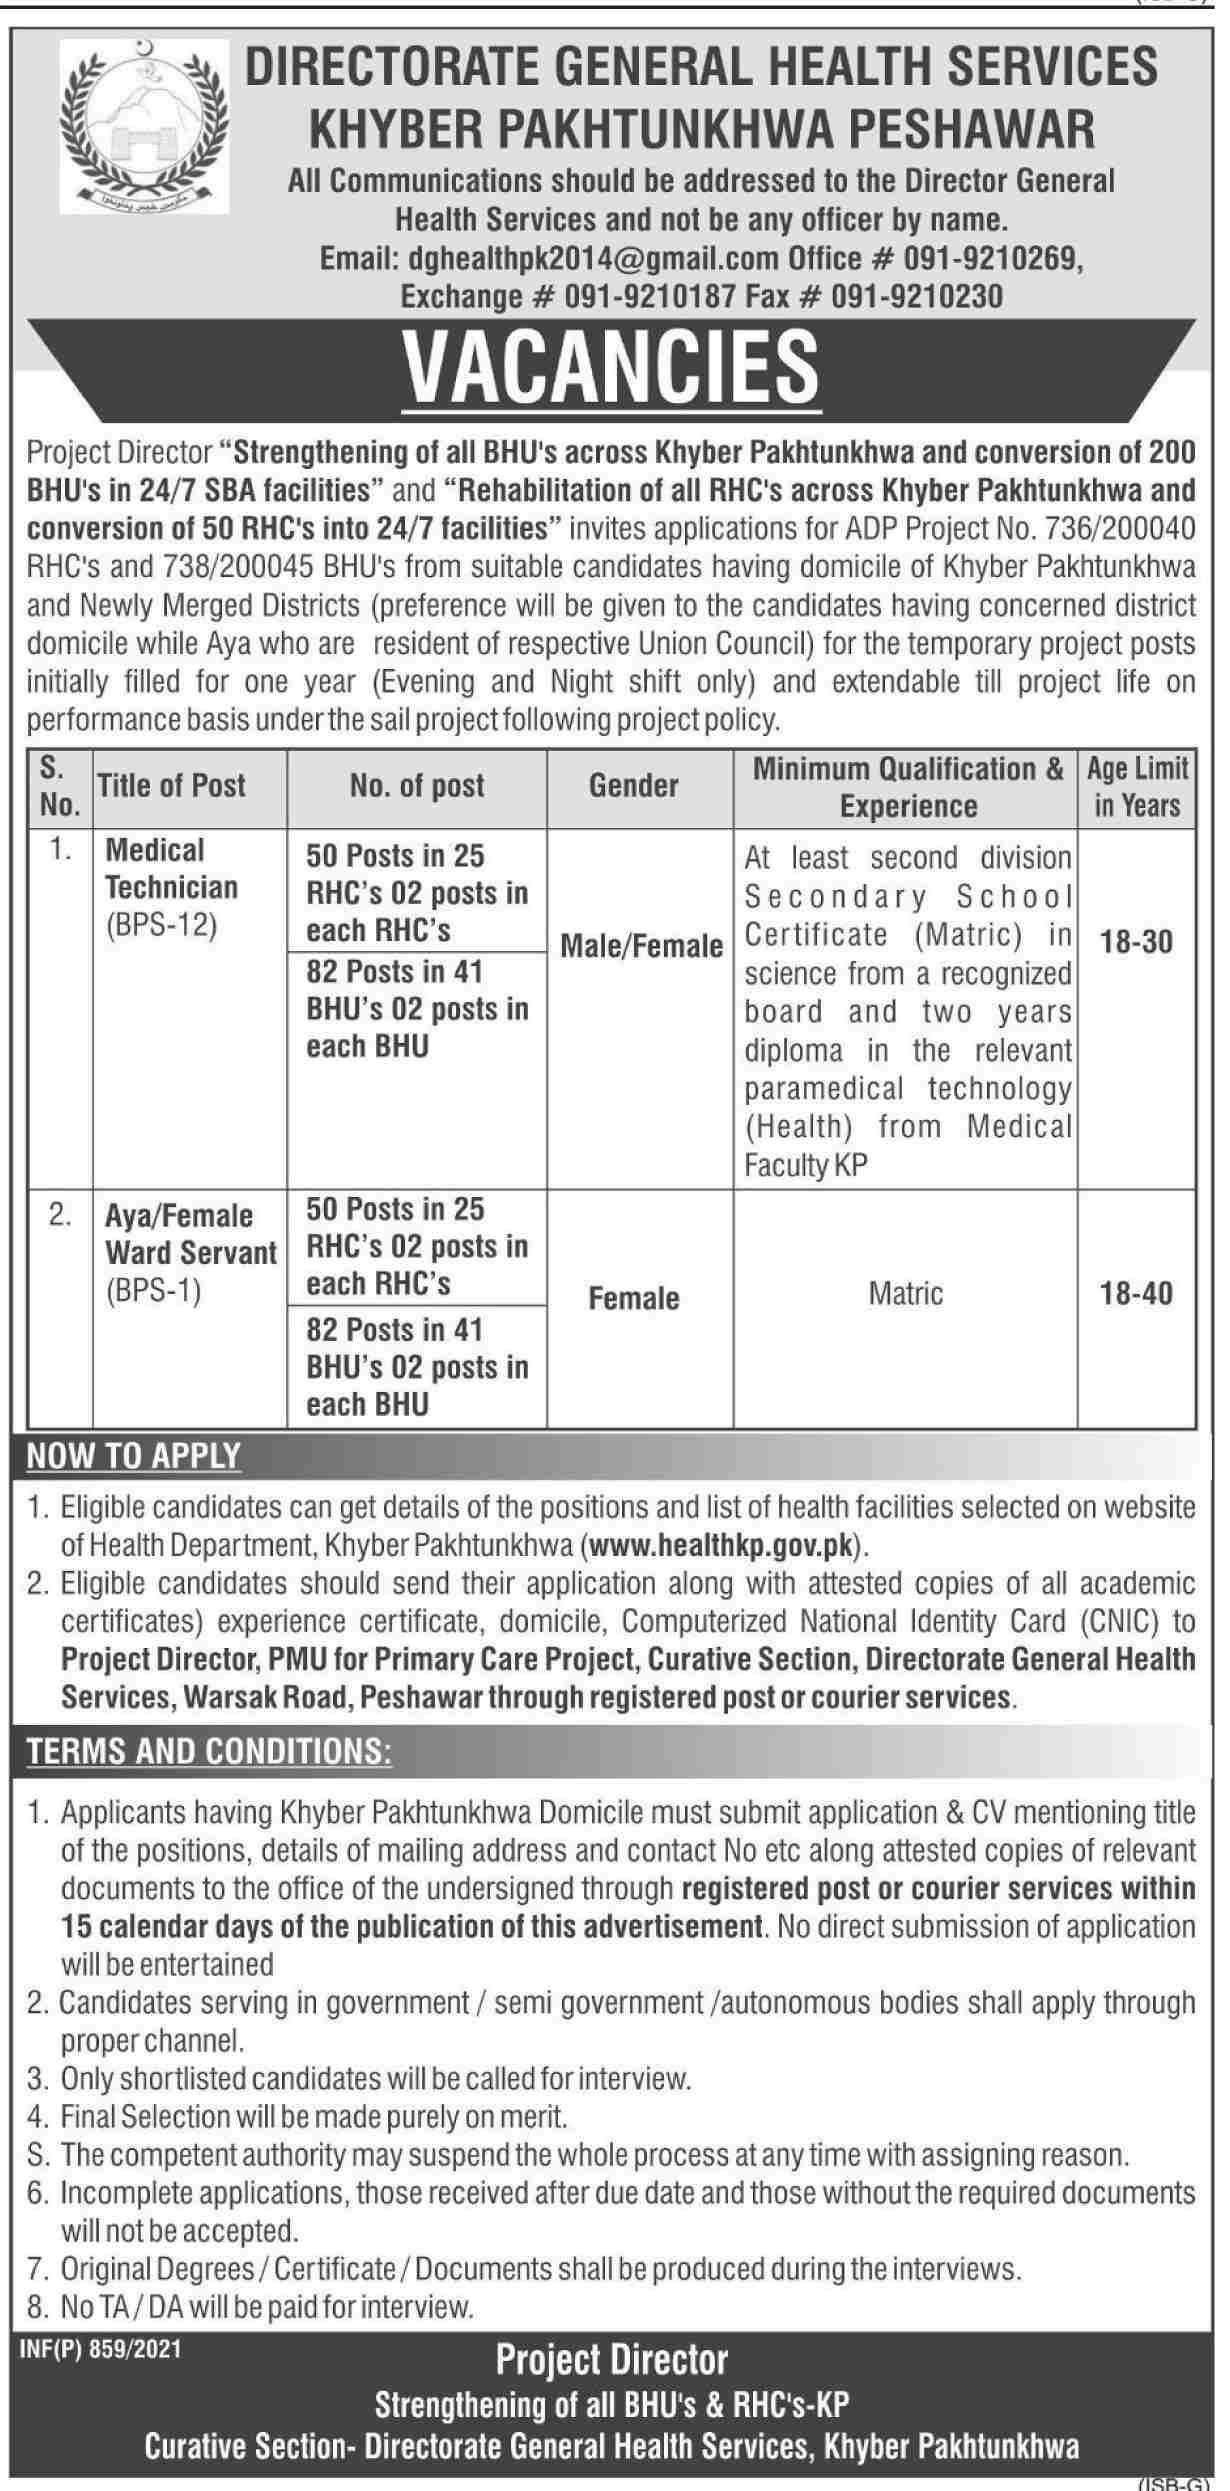 Directorate General Health Services Jobs 2021 in Pakistan - 262 Vacancies in Health Department - Matric Base Jobs 2021 - Intermediate Base Jobs 2021 - Medical Technician Jobs 2021 - Ward Servant Jobs 2021